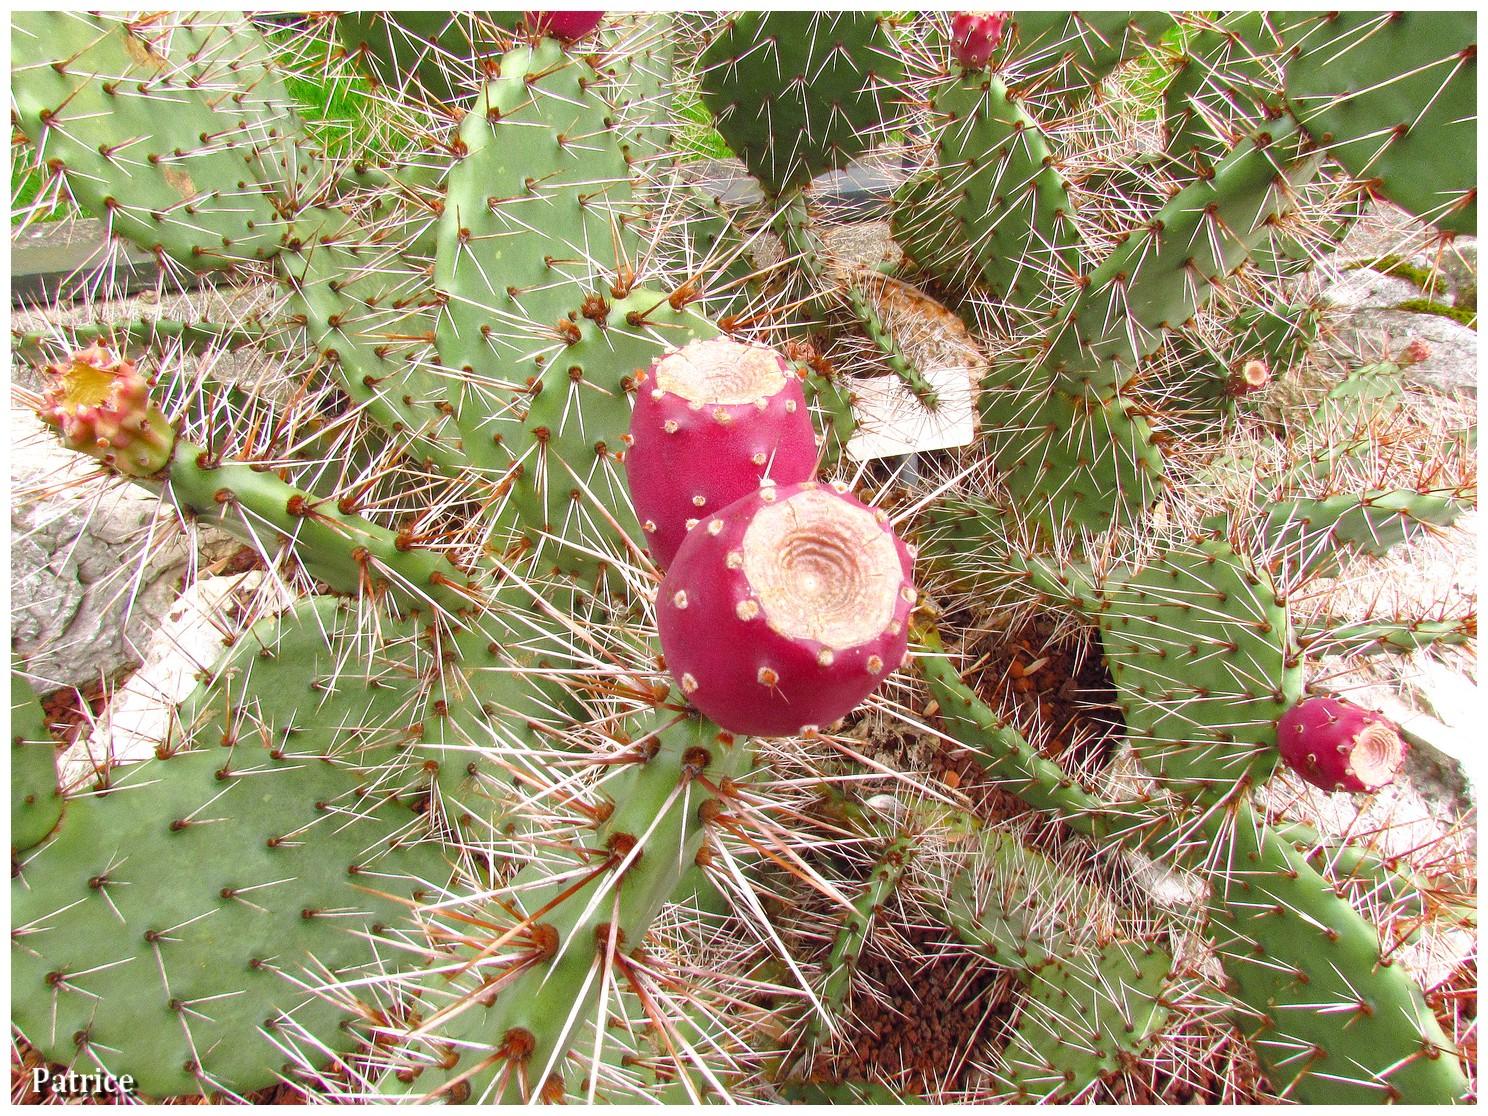 Blog photos de patrice balade jardin des plantes grenoble for Au jardin des plantes chambery